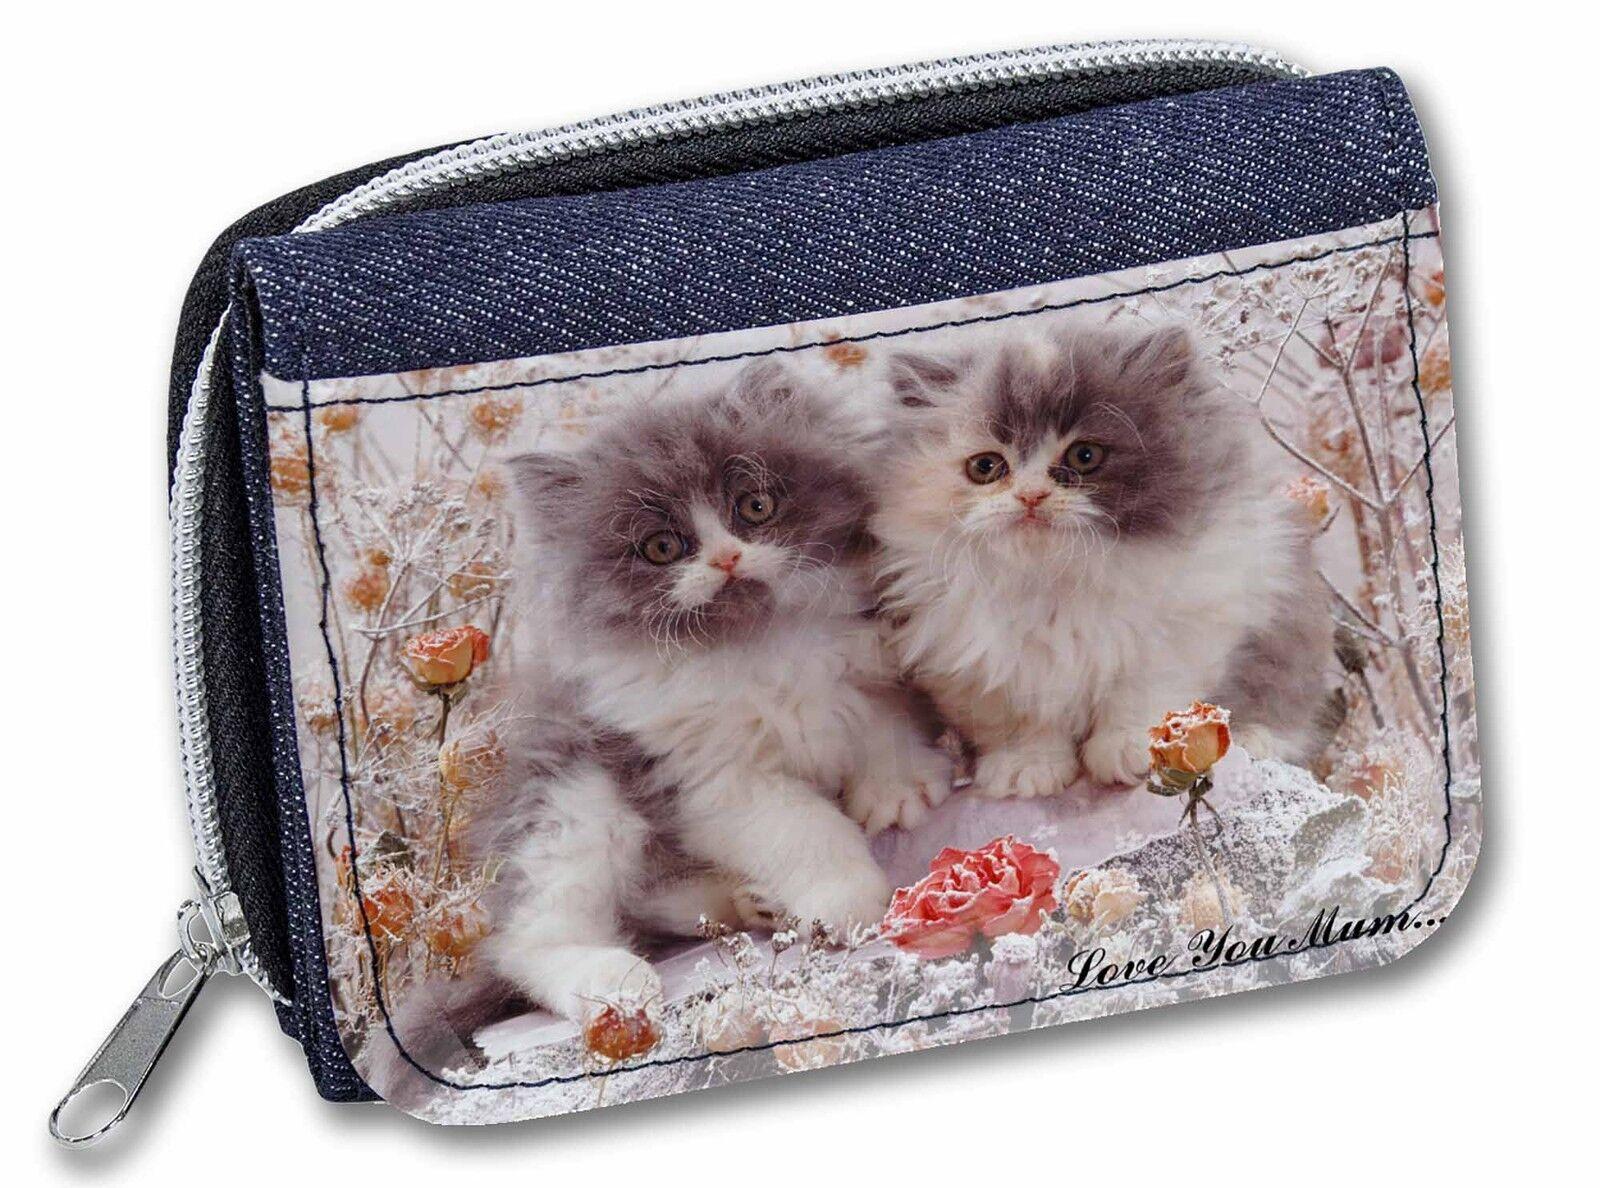 Persian Kittens by Roses 'Love You Mum' Girls/Ladies Denim Purse Wal, AC-60lymJW